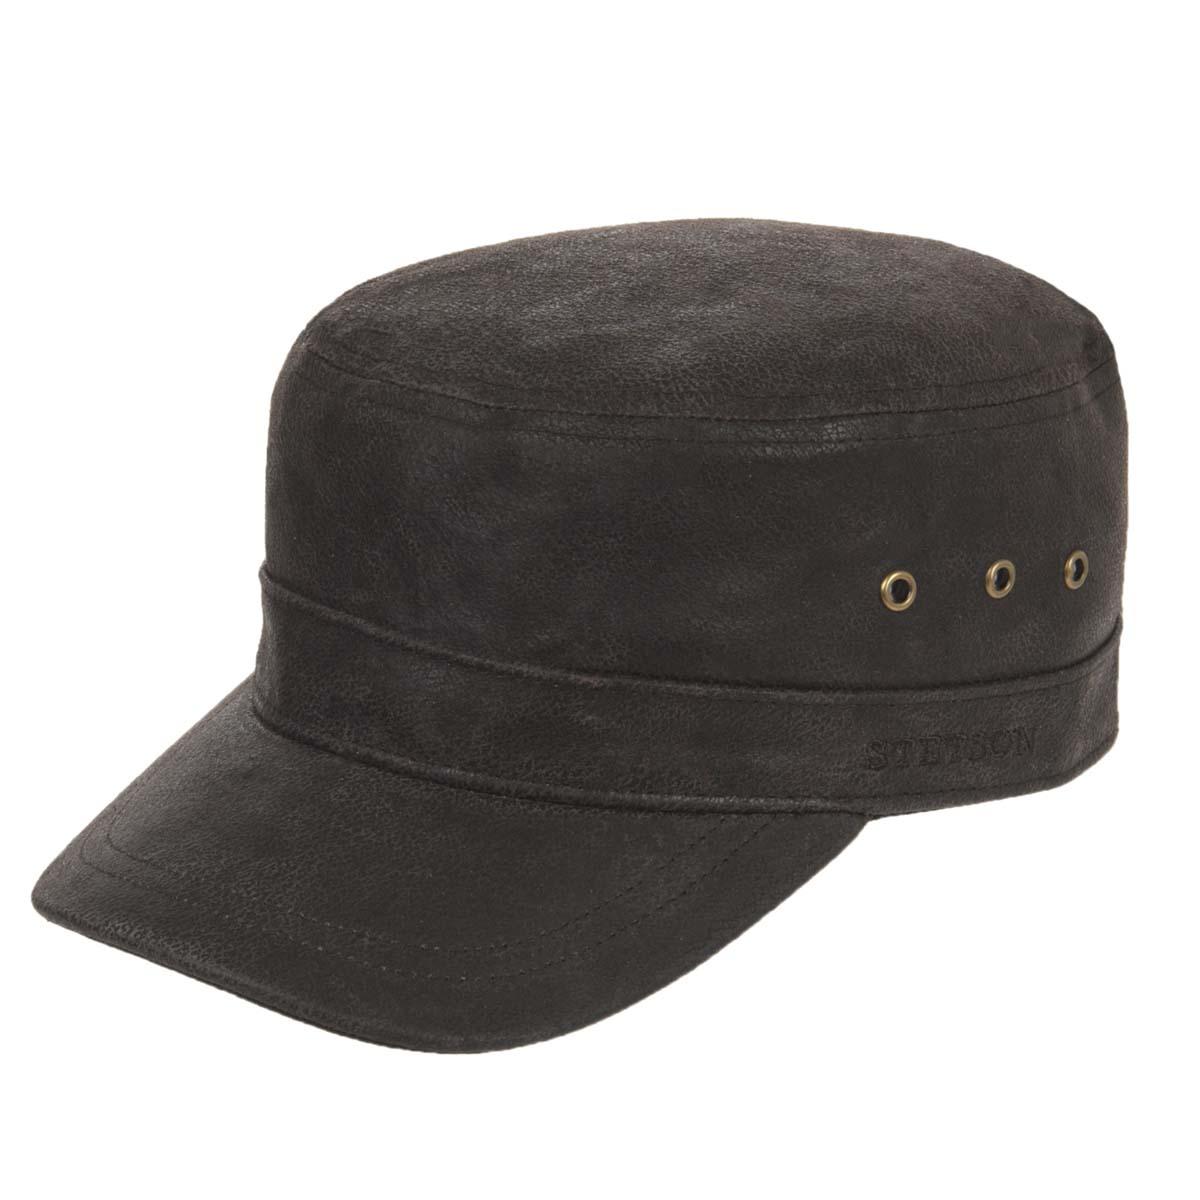 1c06178c4b287 Stetson cap Cuba style in pure leather